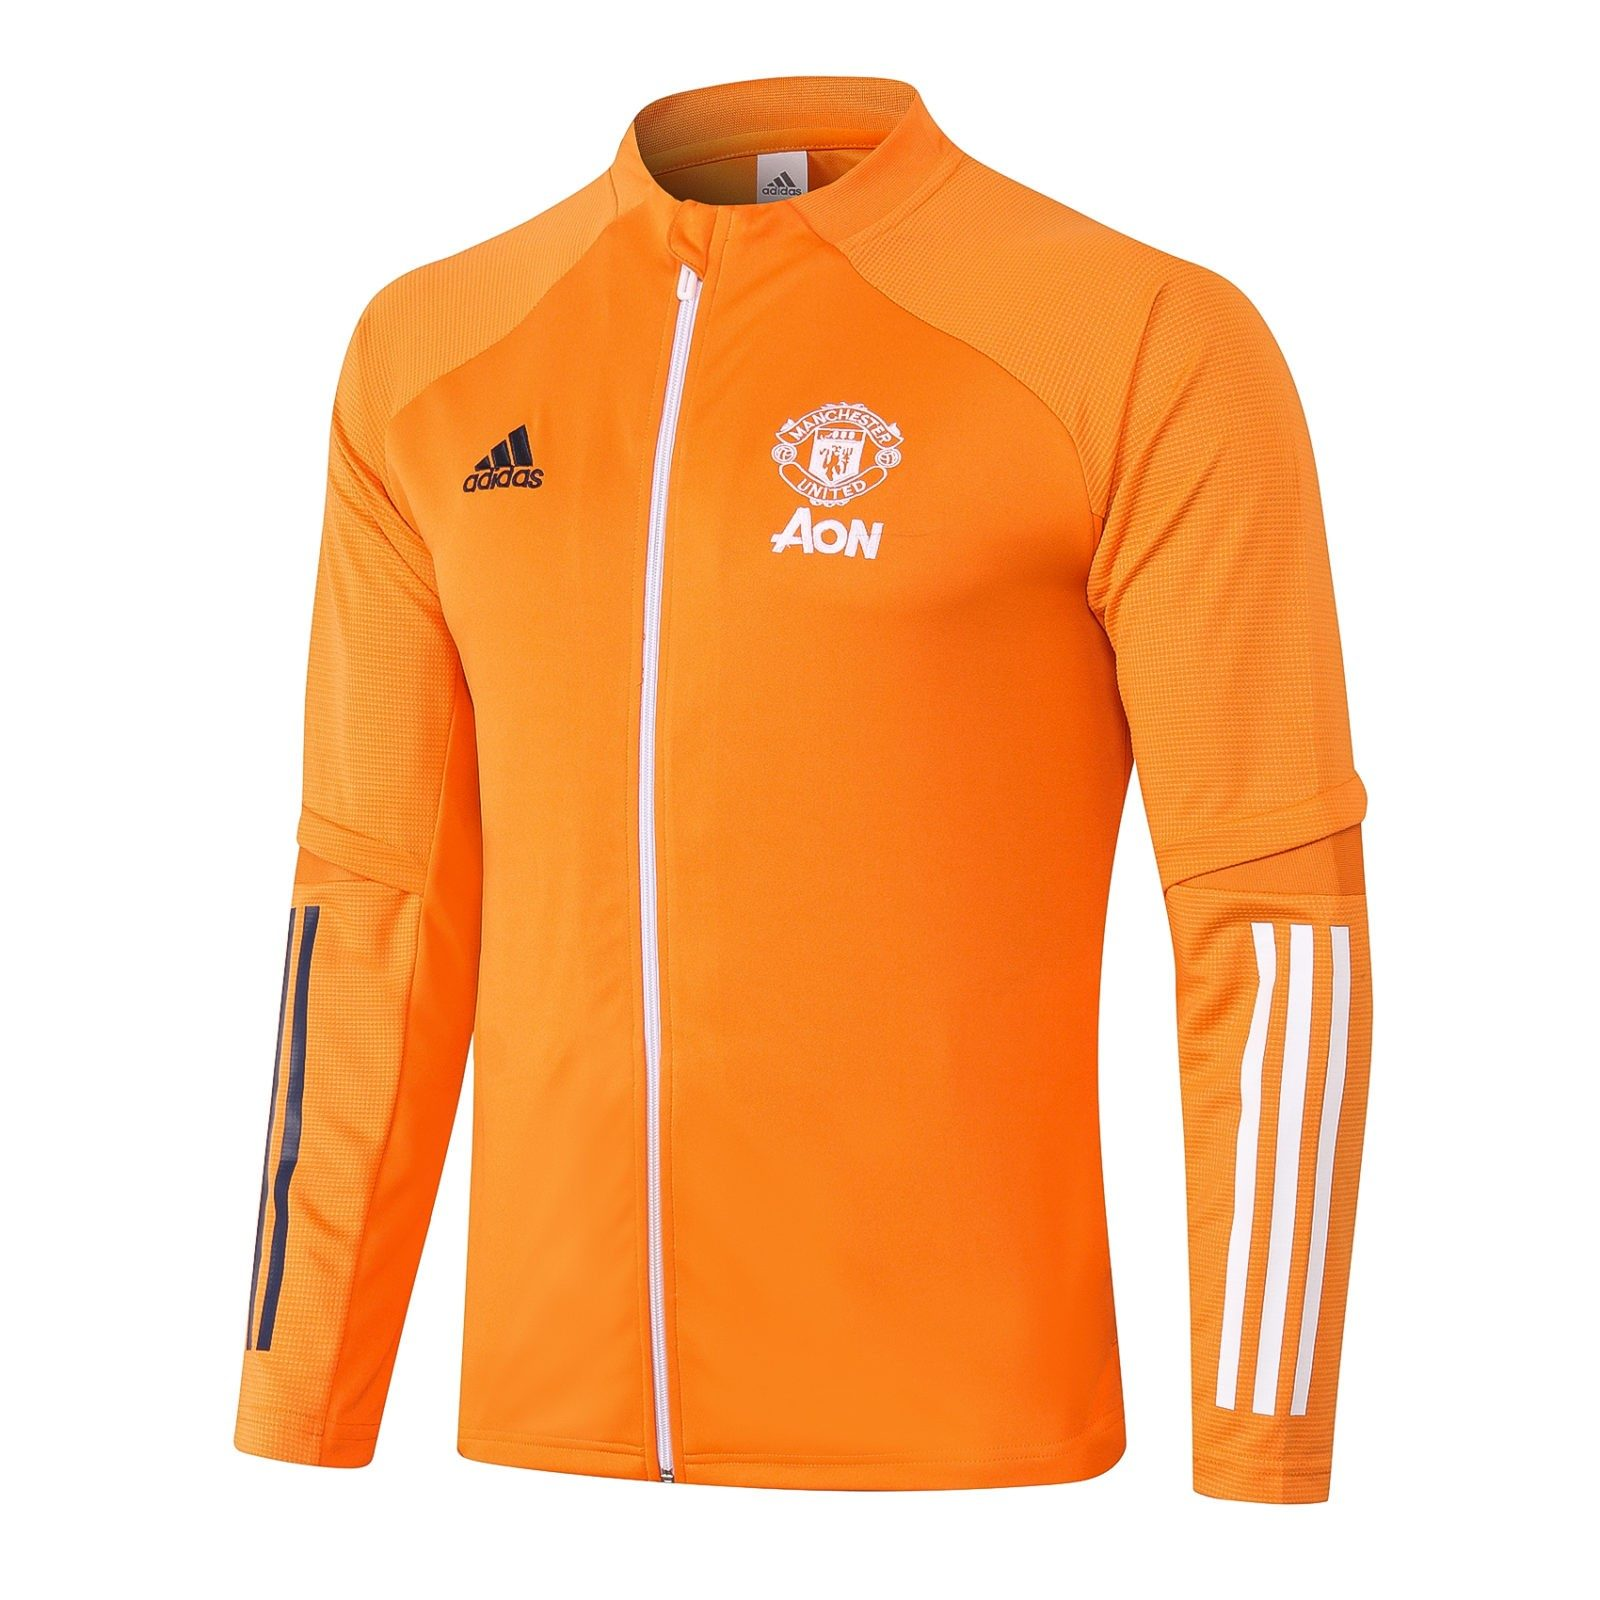 Олимпийка Манчестер Юнайтед сезон 2020-2021 (Оранжевая)